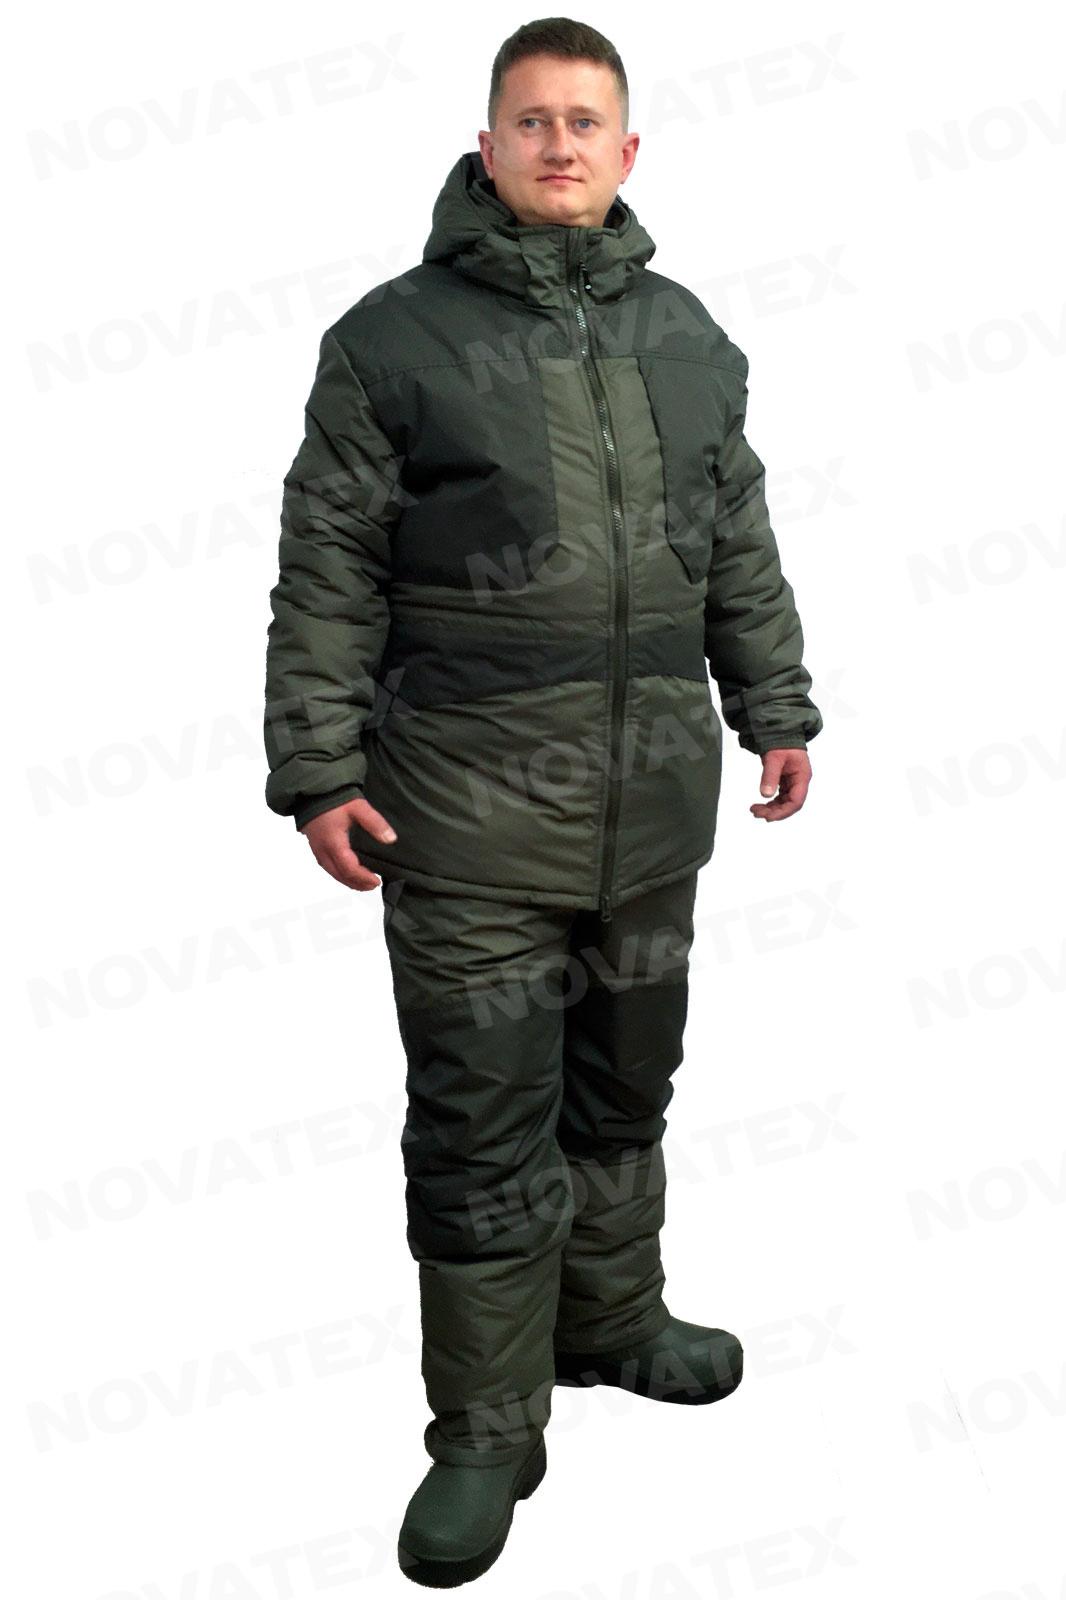 Костюм зимний Novatex Квест Следопыт п/э хаки -30C